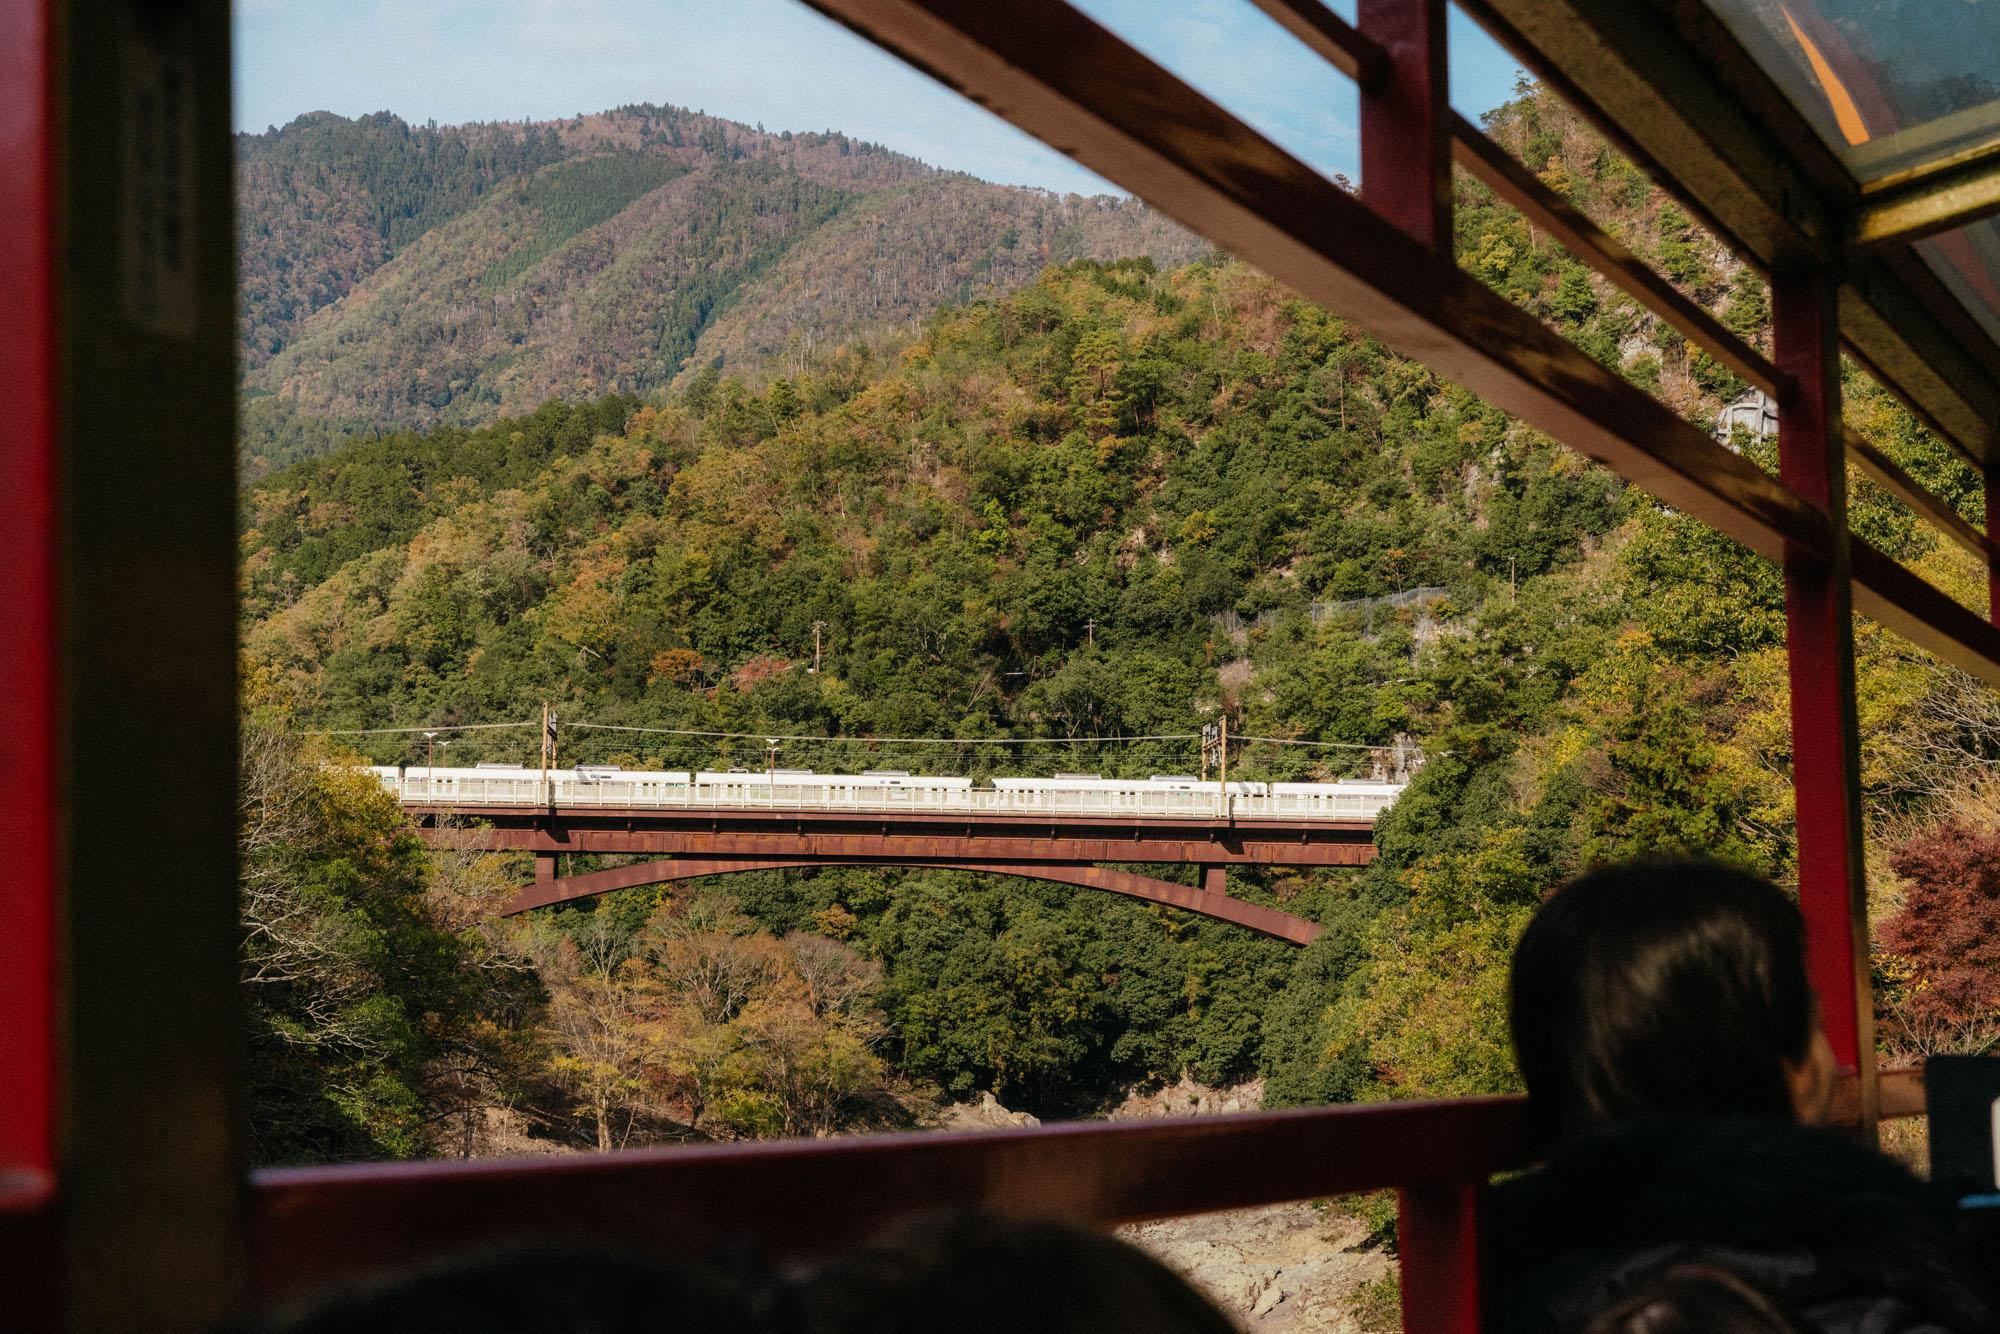 A ride on the Sagano Romantic Train to view the autumn foliage